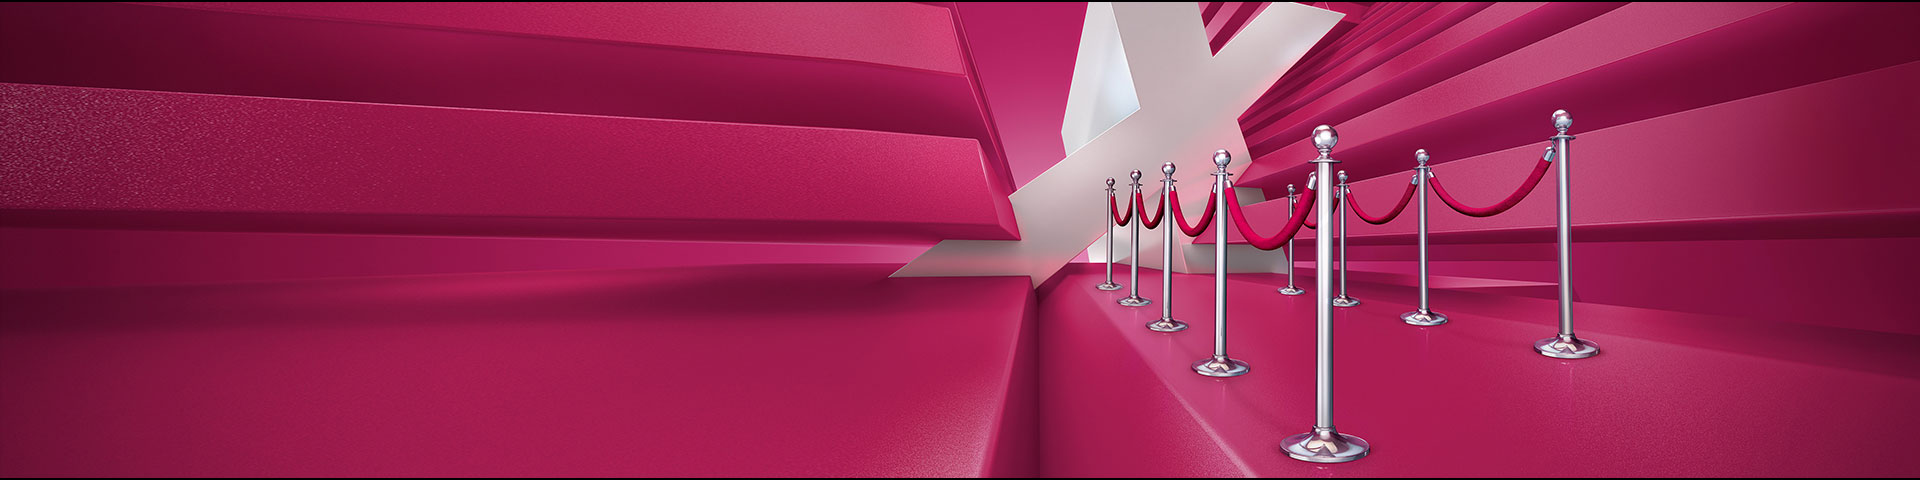 event highlights im kino. Black Bedroom Furniture Sets. Home Design Ideas